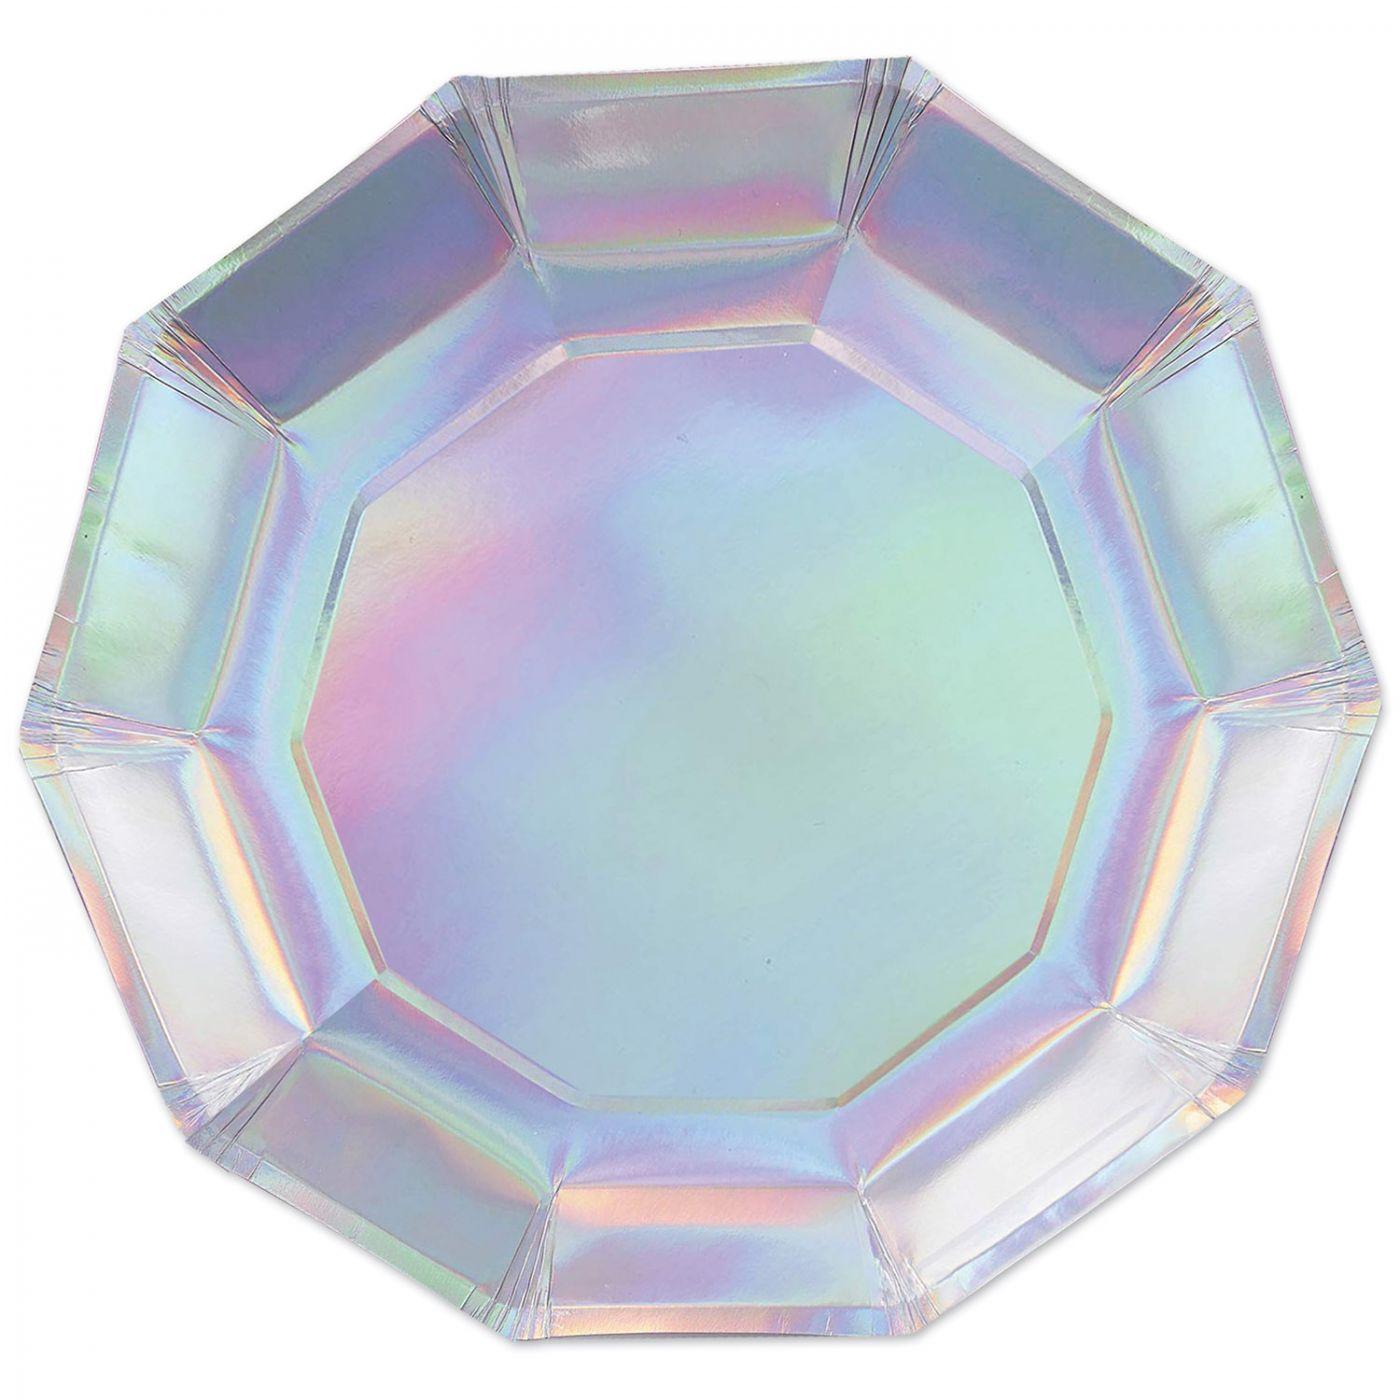 Iridescent Decagon Plates image